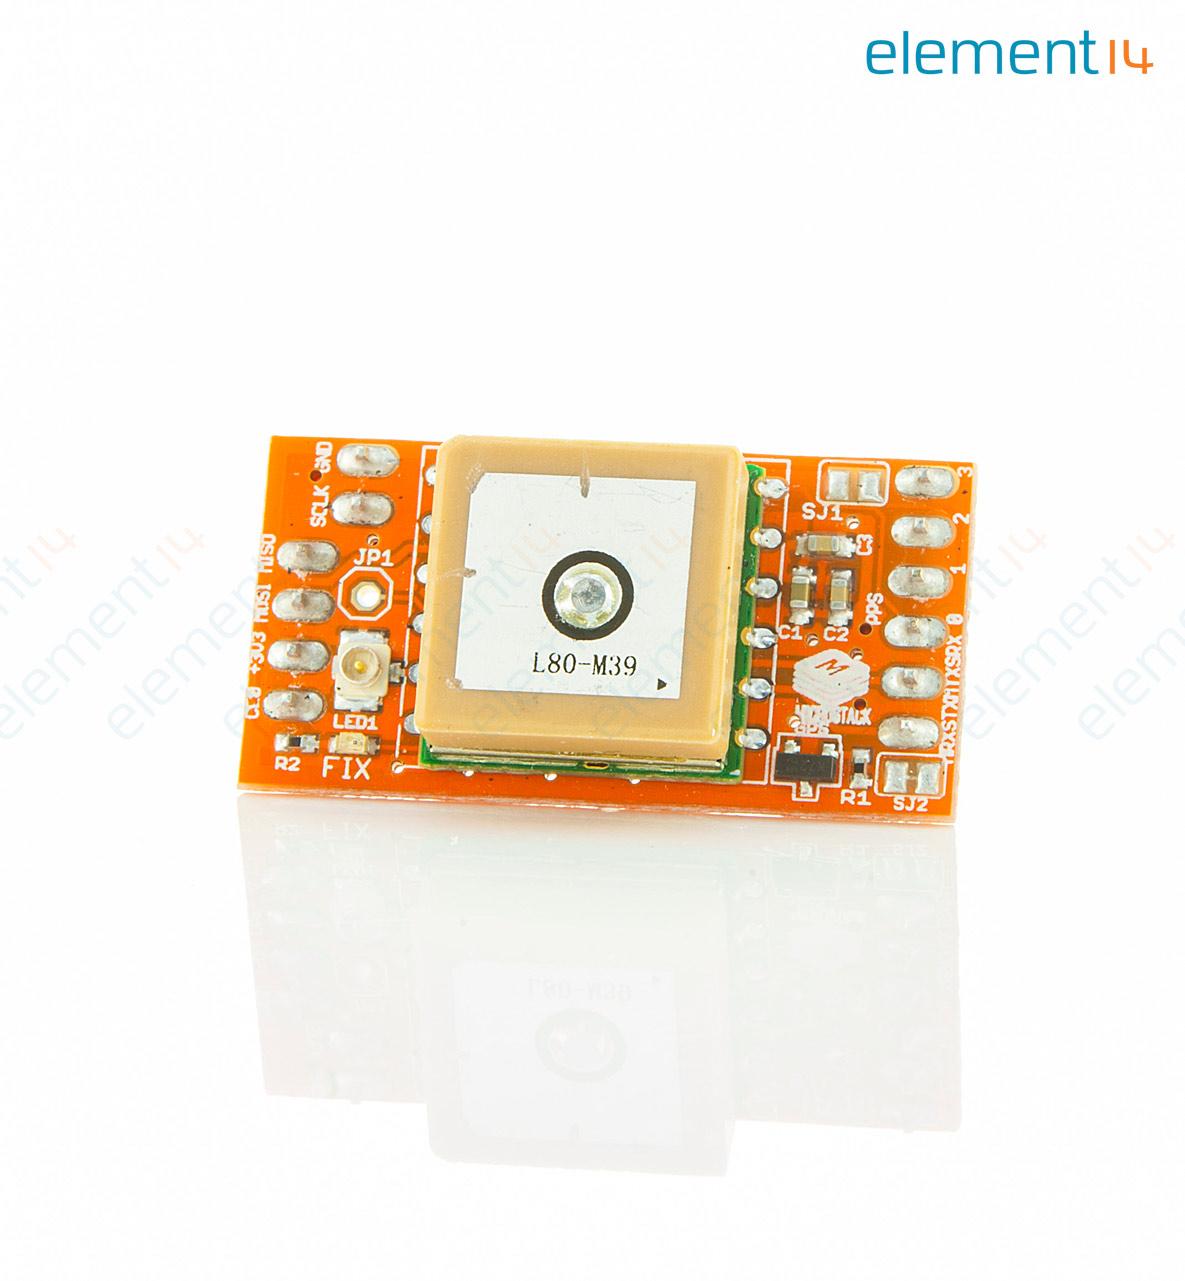 Microstack Gps Expansion Board Accessory Circuit Module Buy Boardgps Tracking Pcbgps